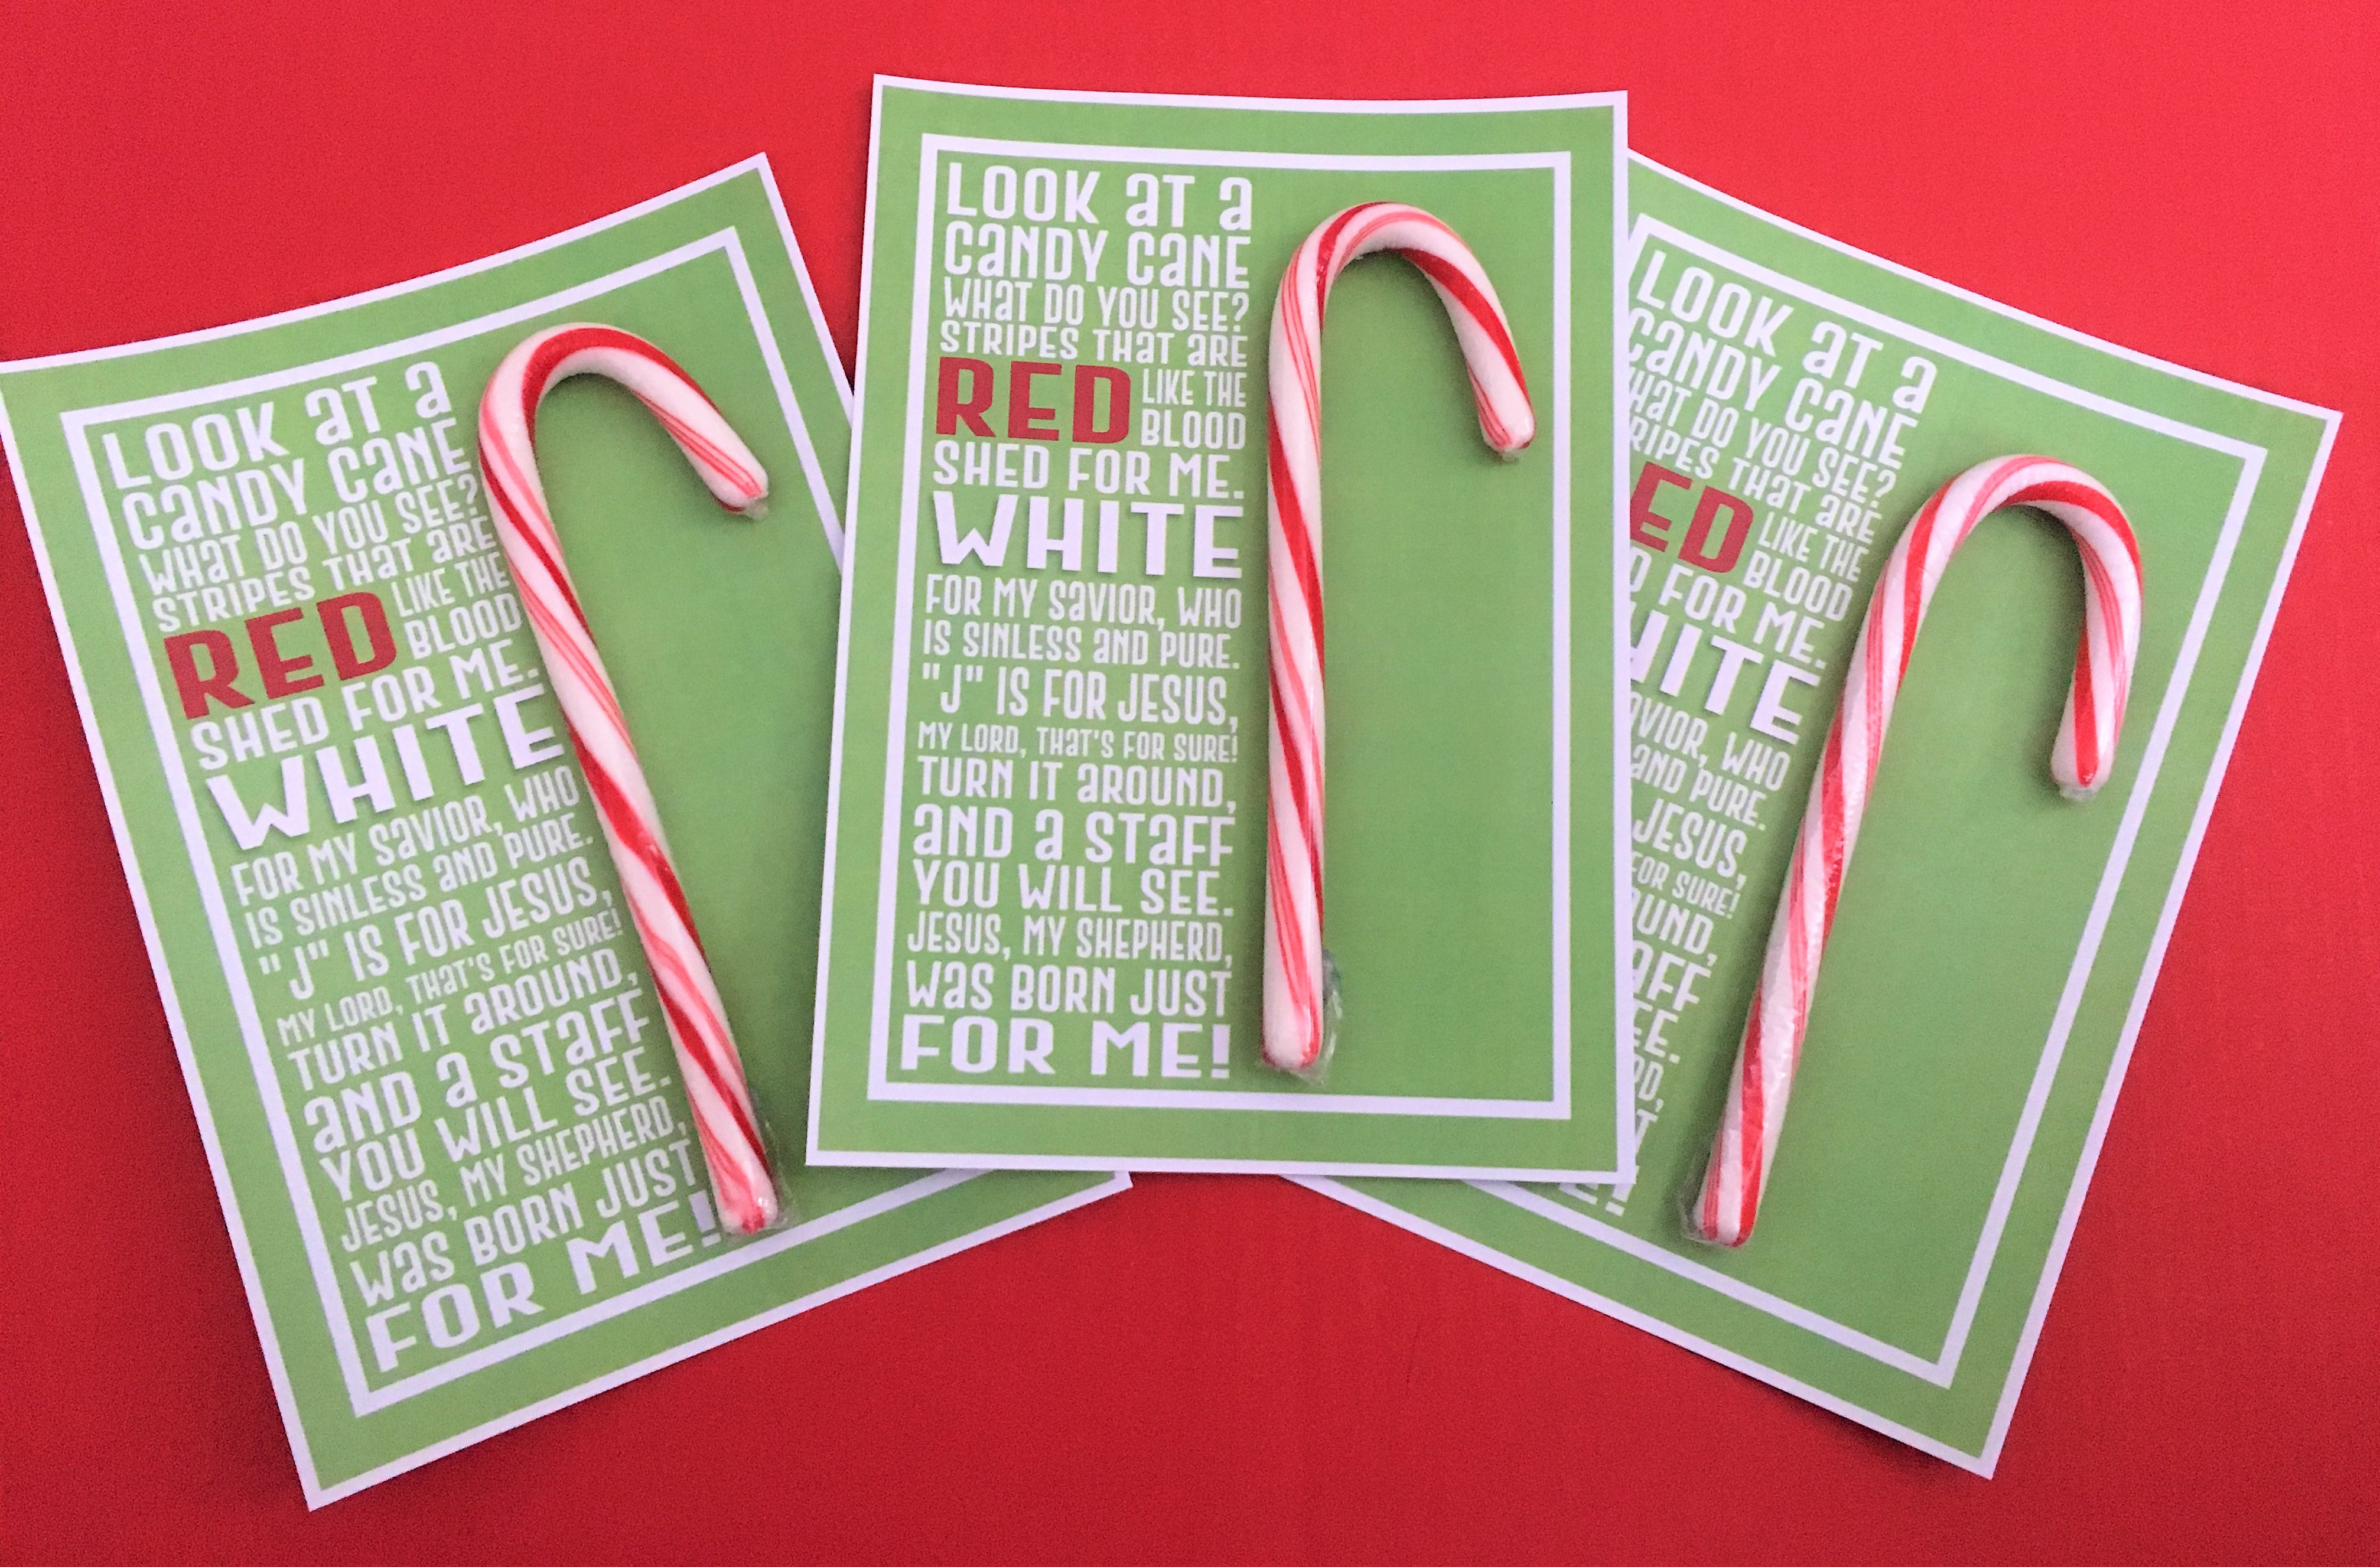 Candy Cane Poem Printable – Deeper Kidmin - Free Printable Candy Cane Poem